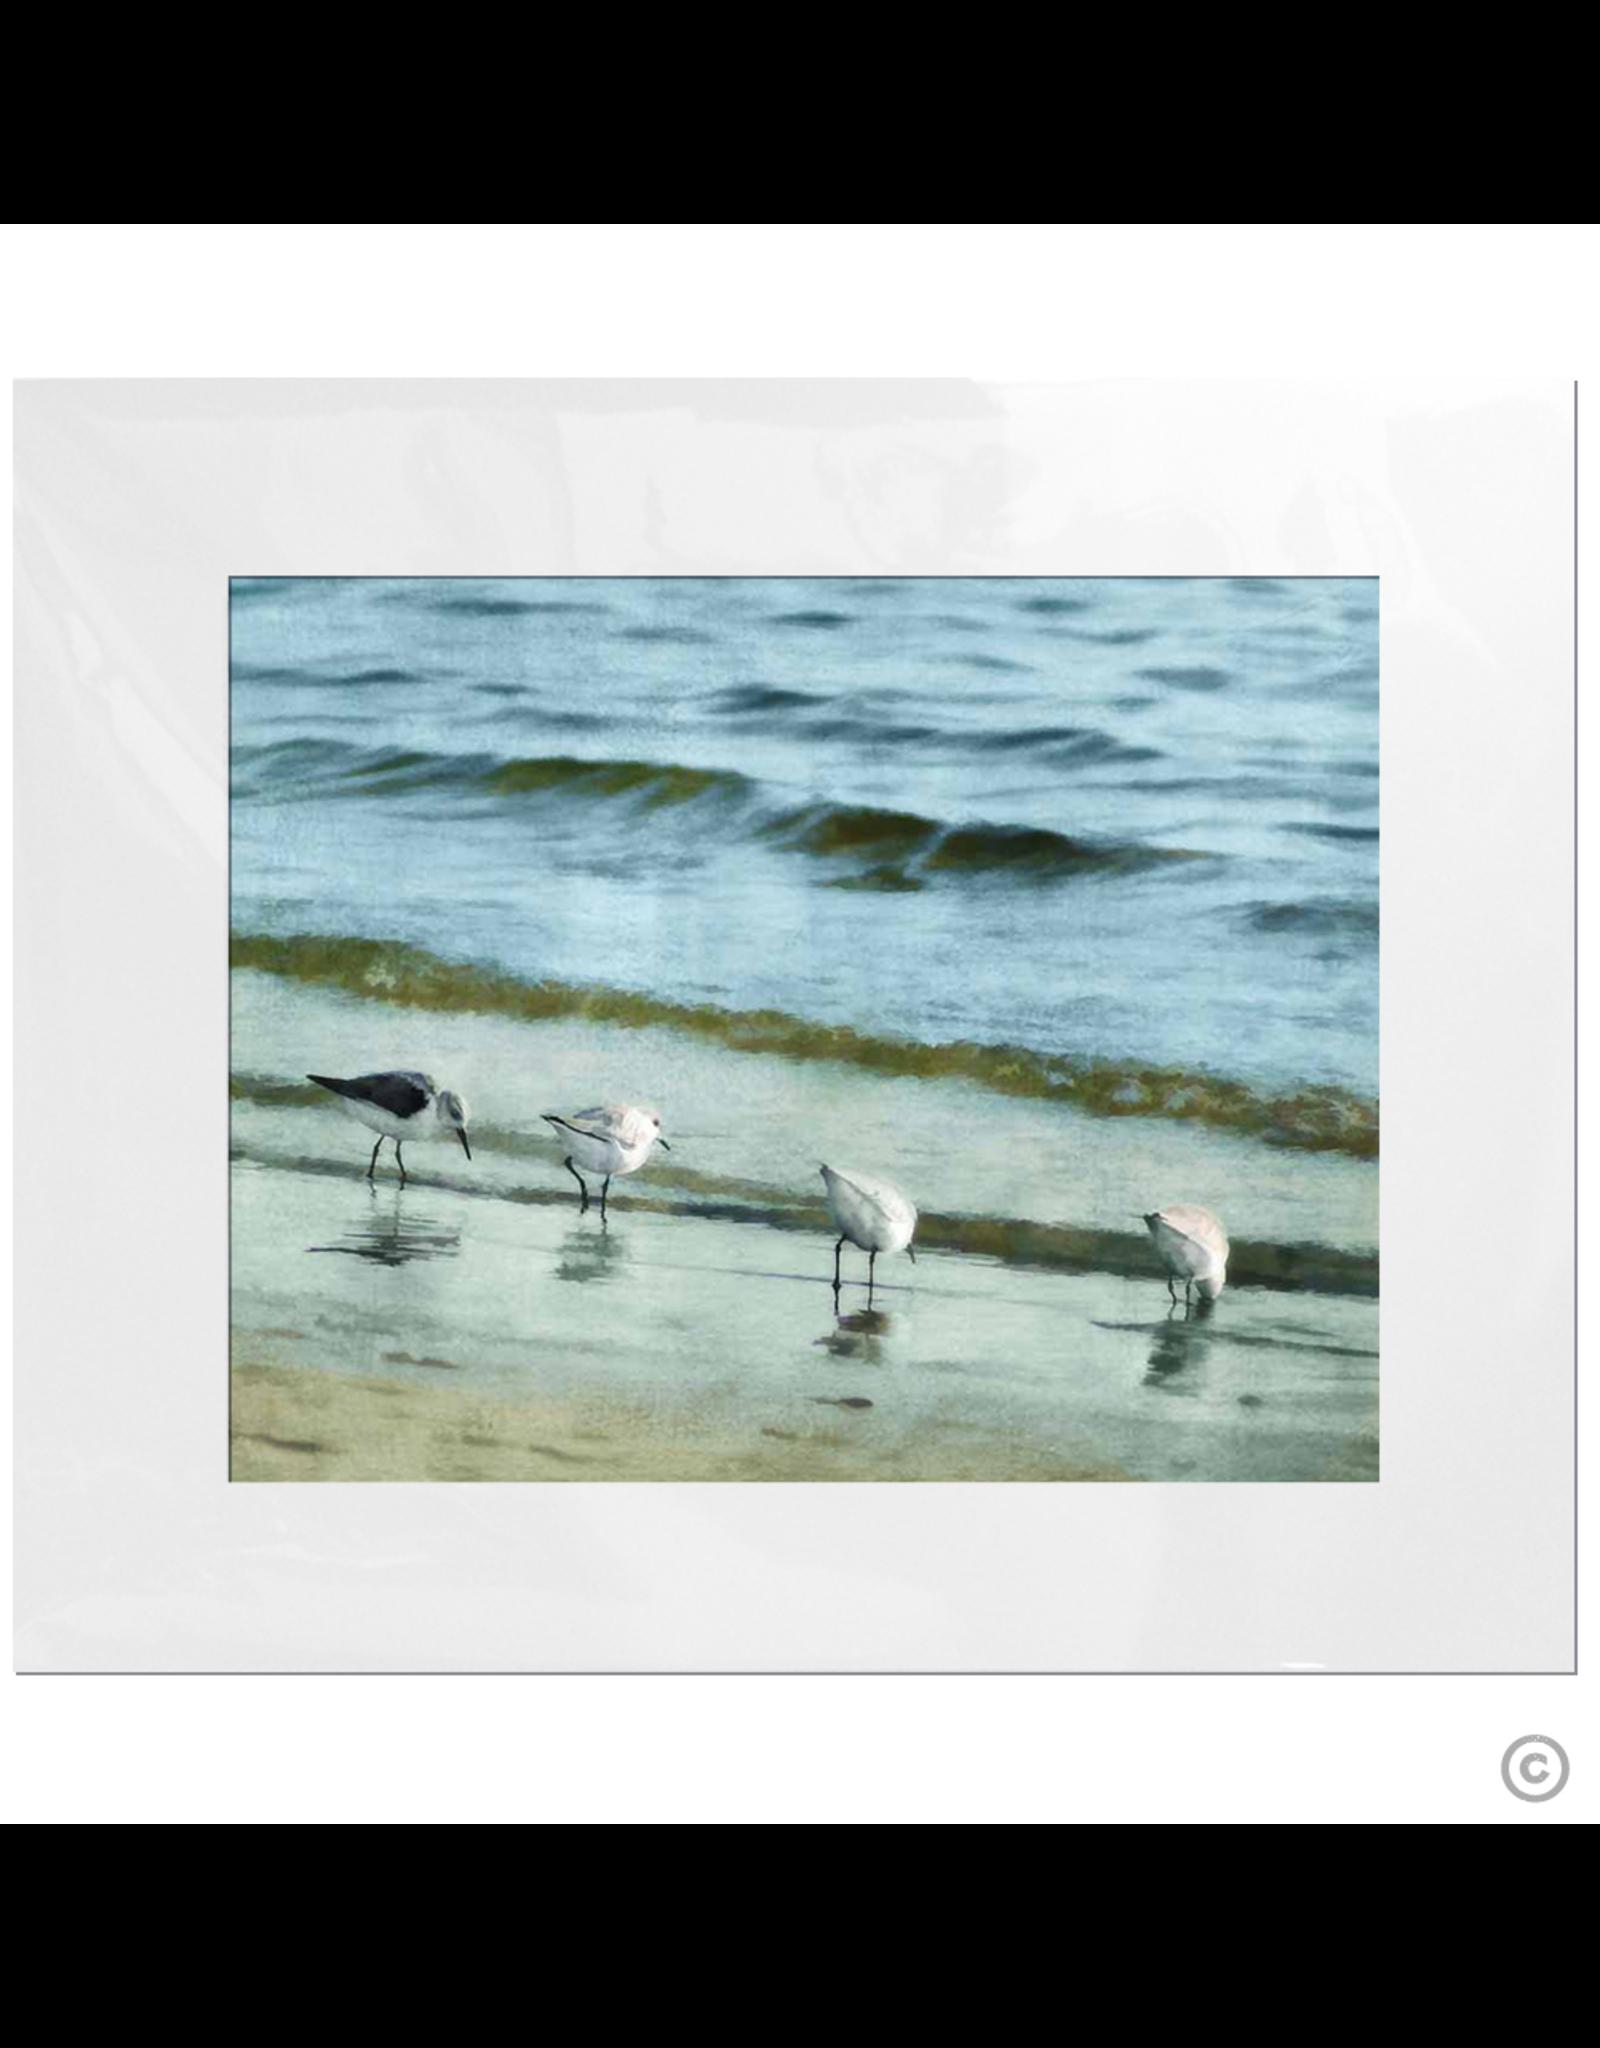 Maureen Terrien Photography Art Print 4 Sandpipers I 11x14 - 8x10 Matted